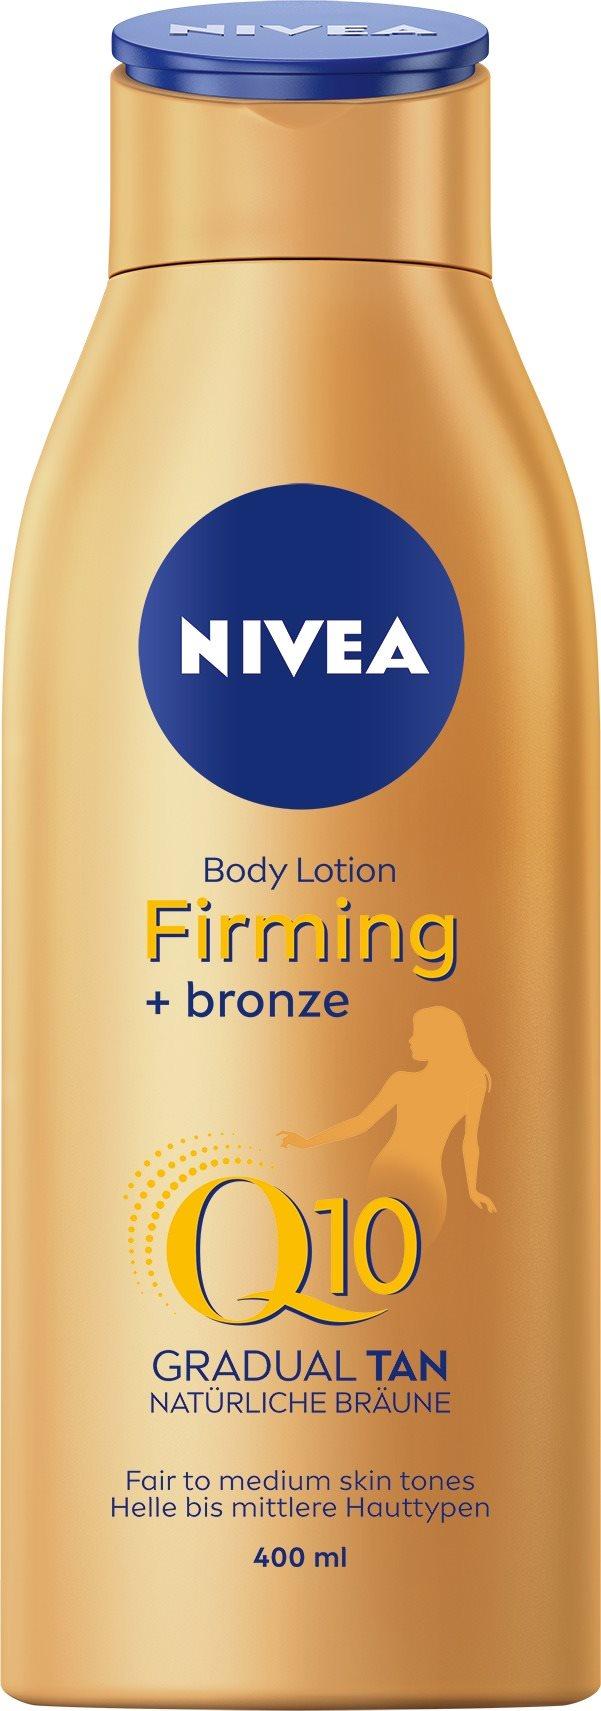 NIVEA Firming + Bronze Q10 Body Lotion 400 ml